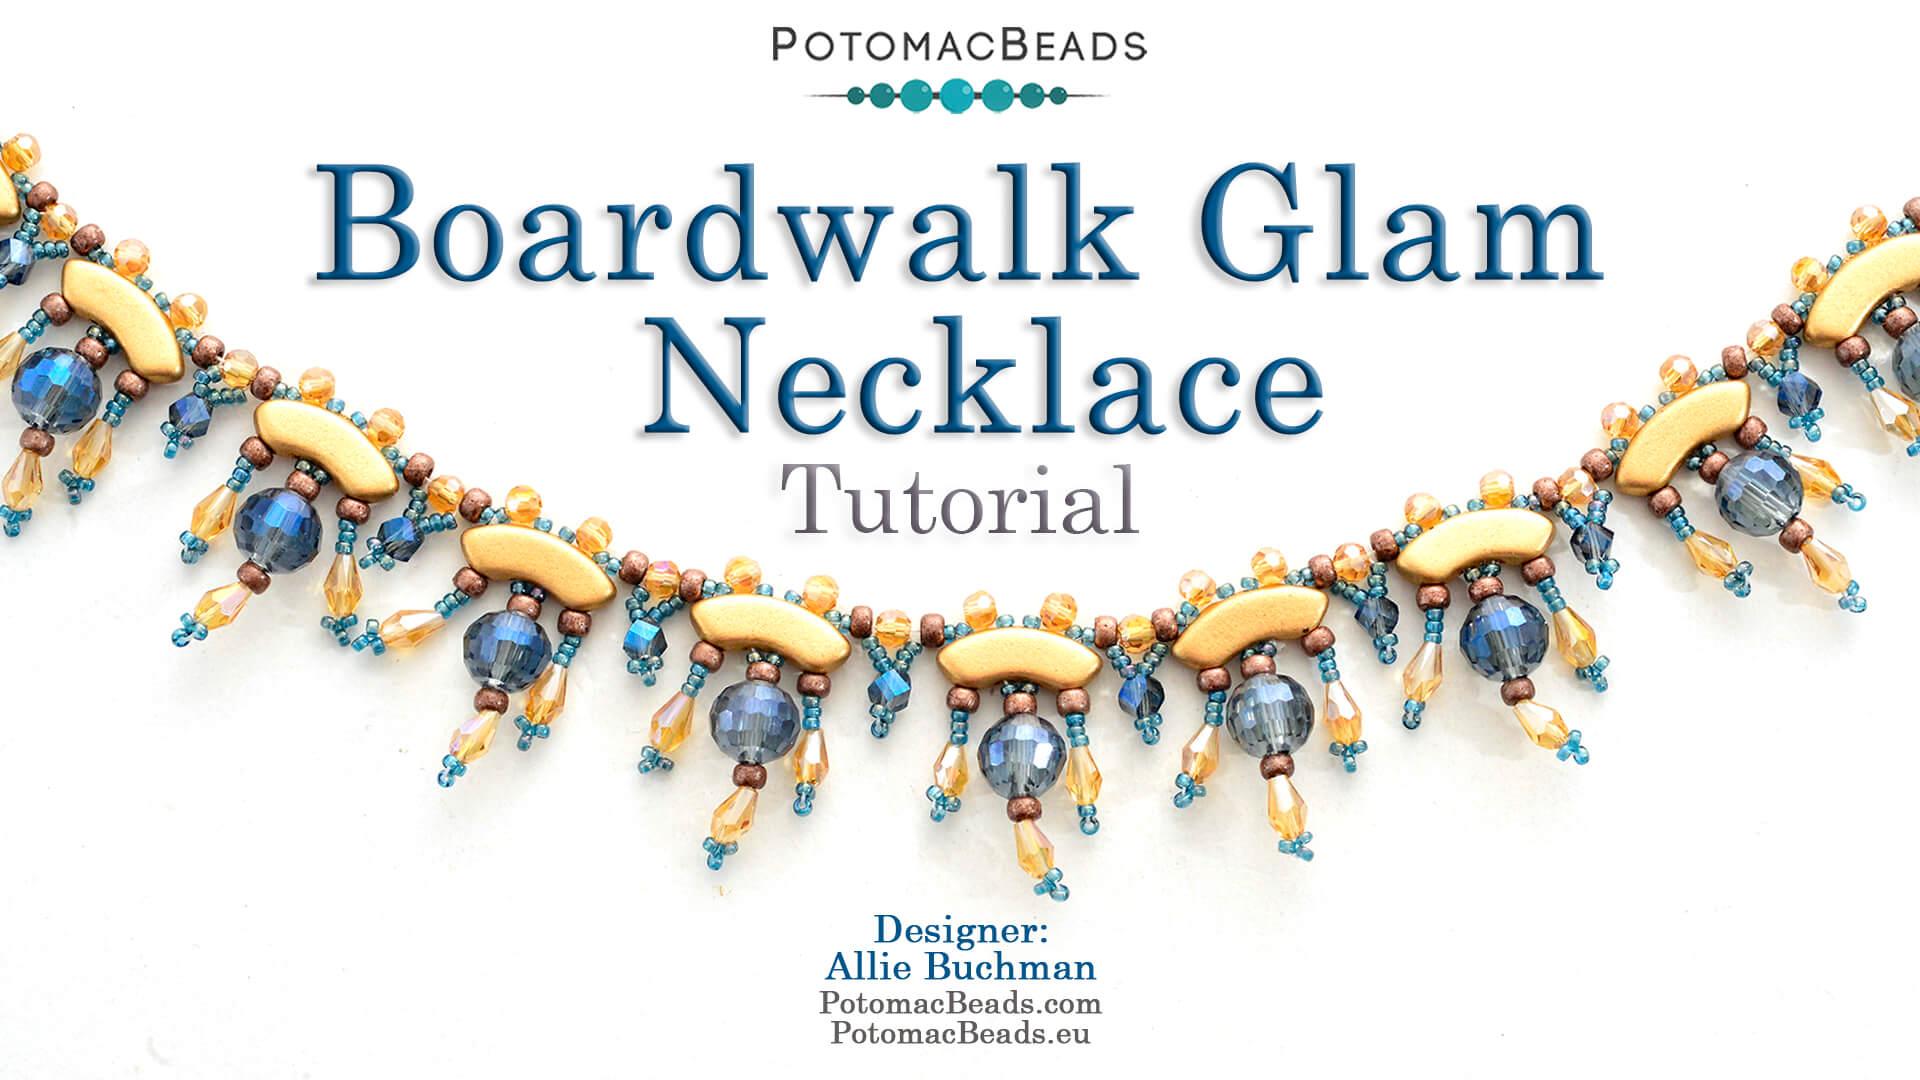 How to Bead Jewelry / Beading Tutorials & Jewel Making Videos / Bead Weaving Tutorials & Necklace Tutorial / Boardwalk Glam Necklace Tutorial